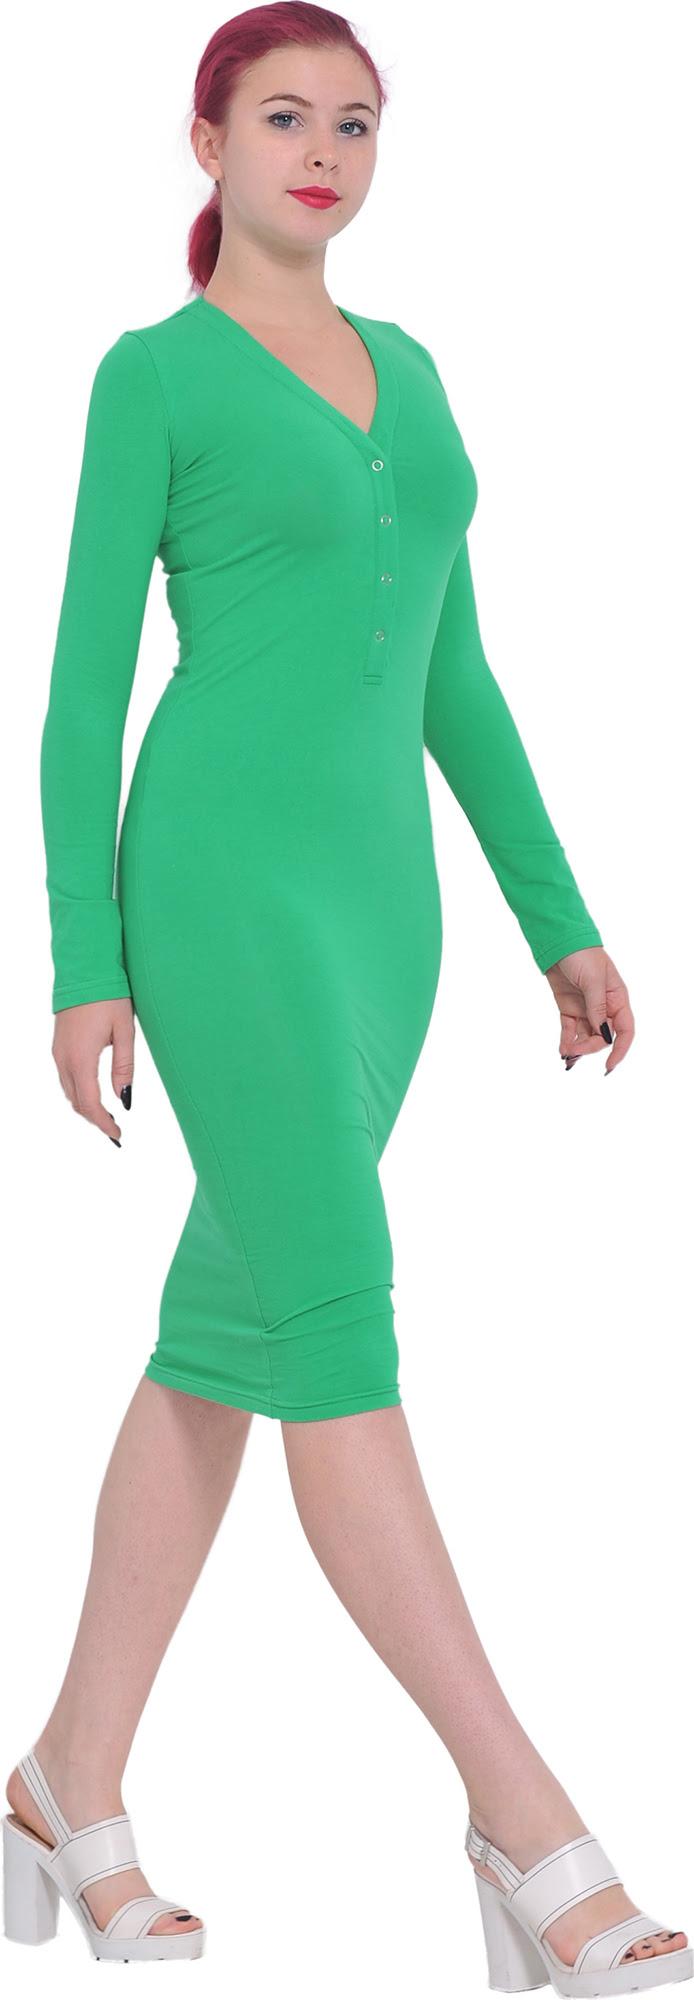 Bodycon dresses long sleeve knee length pumps